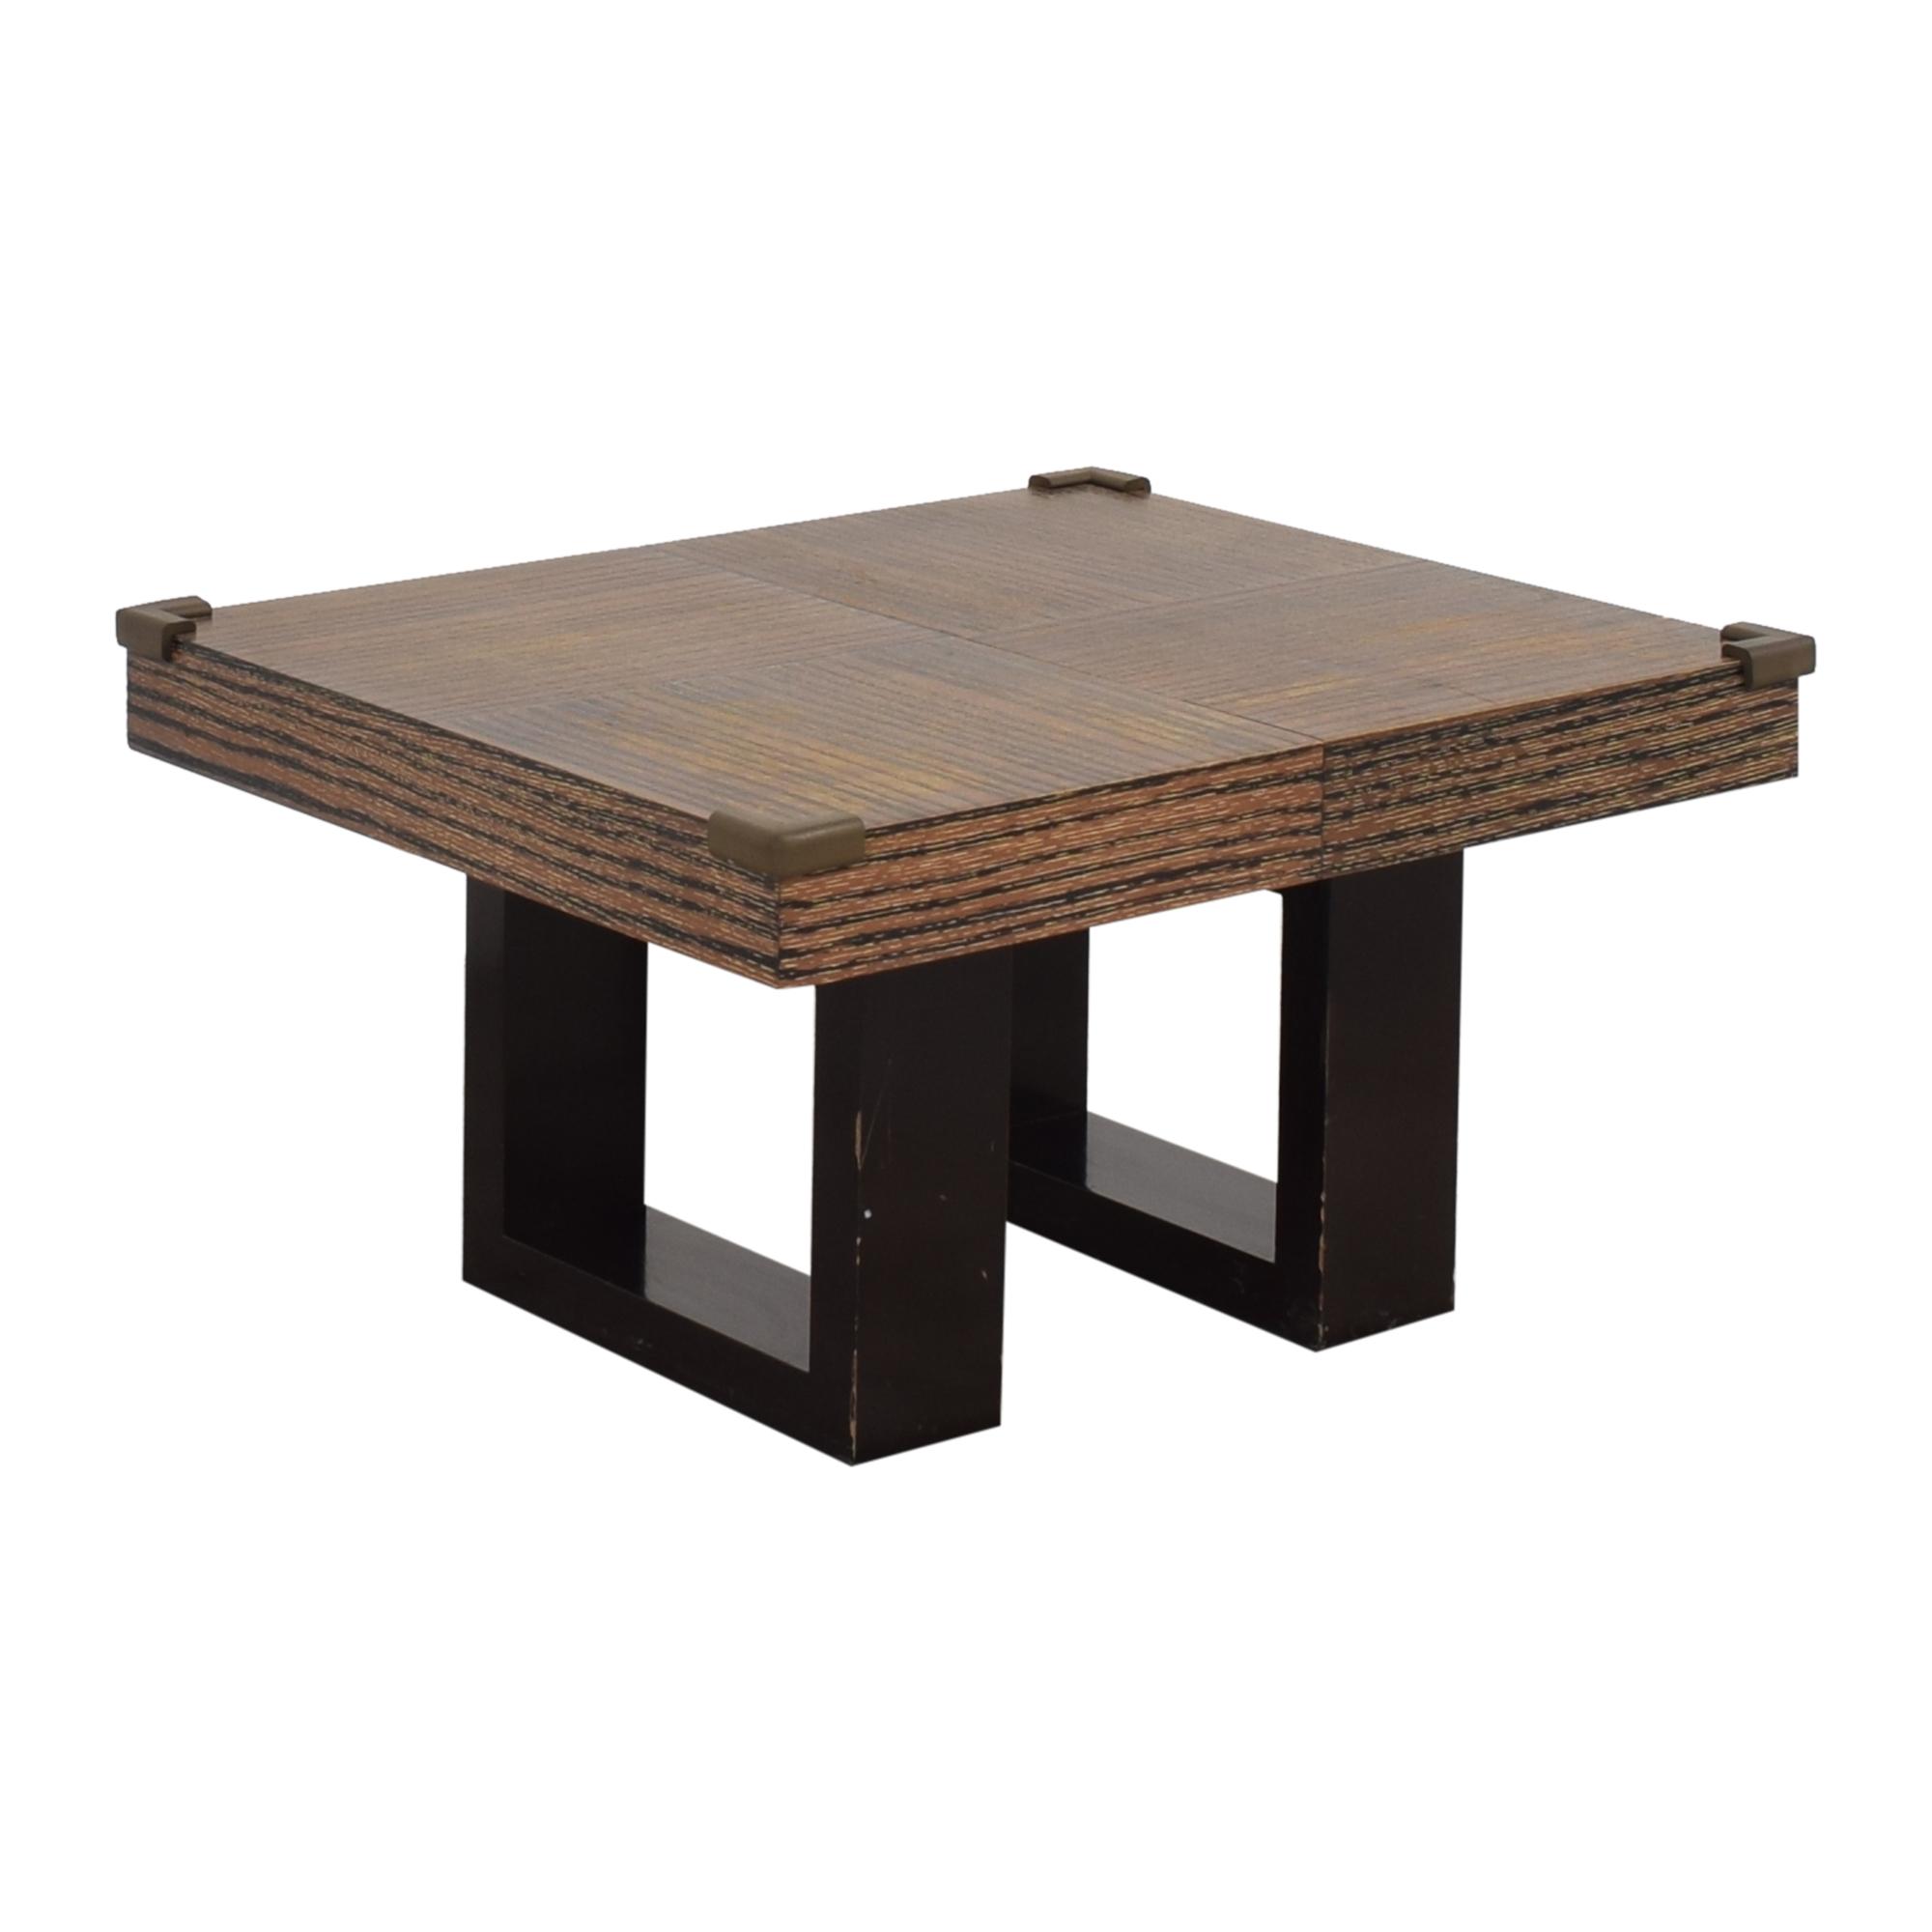 shop Michael Berman Limited Trousdale Coffee Table Michael Berman Limited Tables